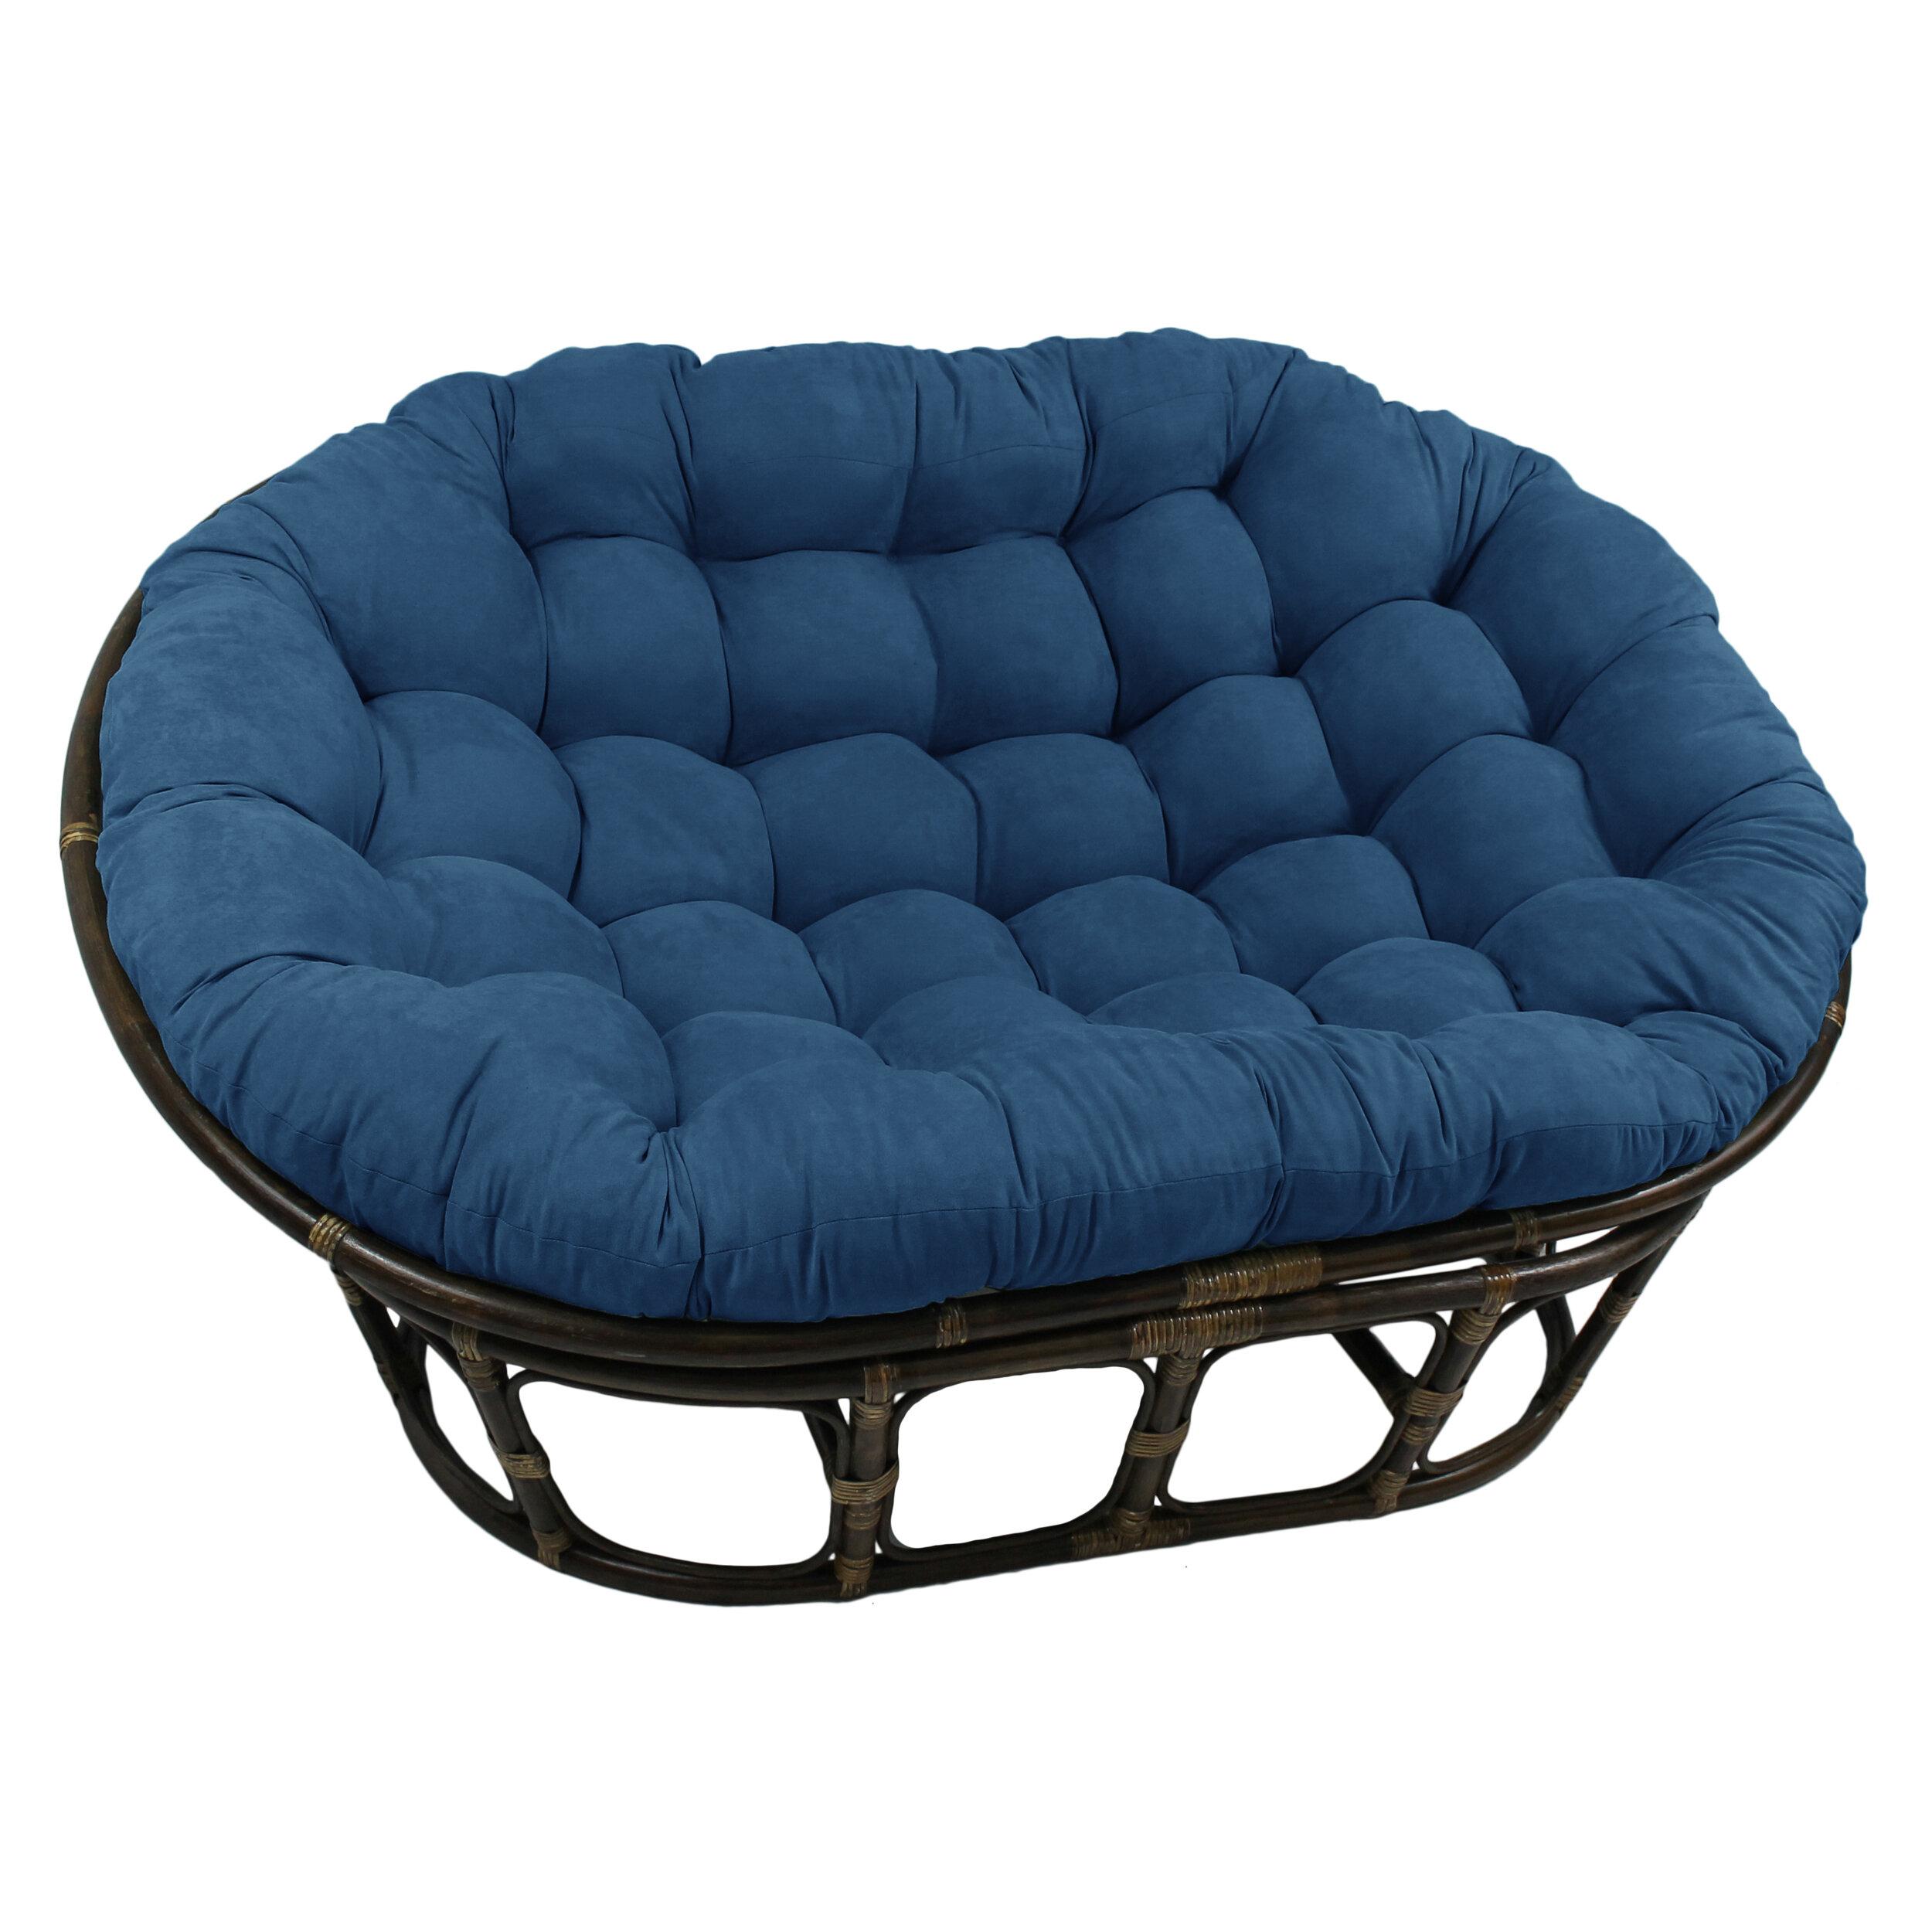 International Caravan Double Papasan Chair Home Garden Furniture Chairs